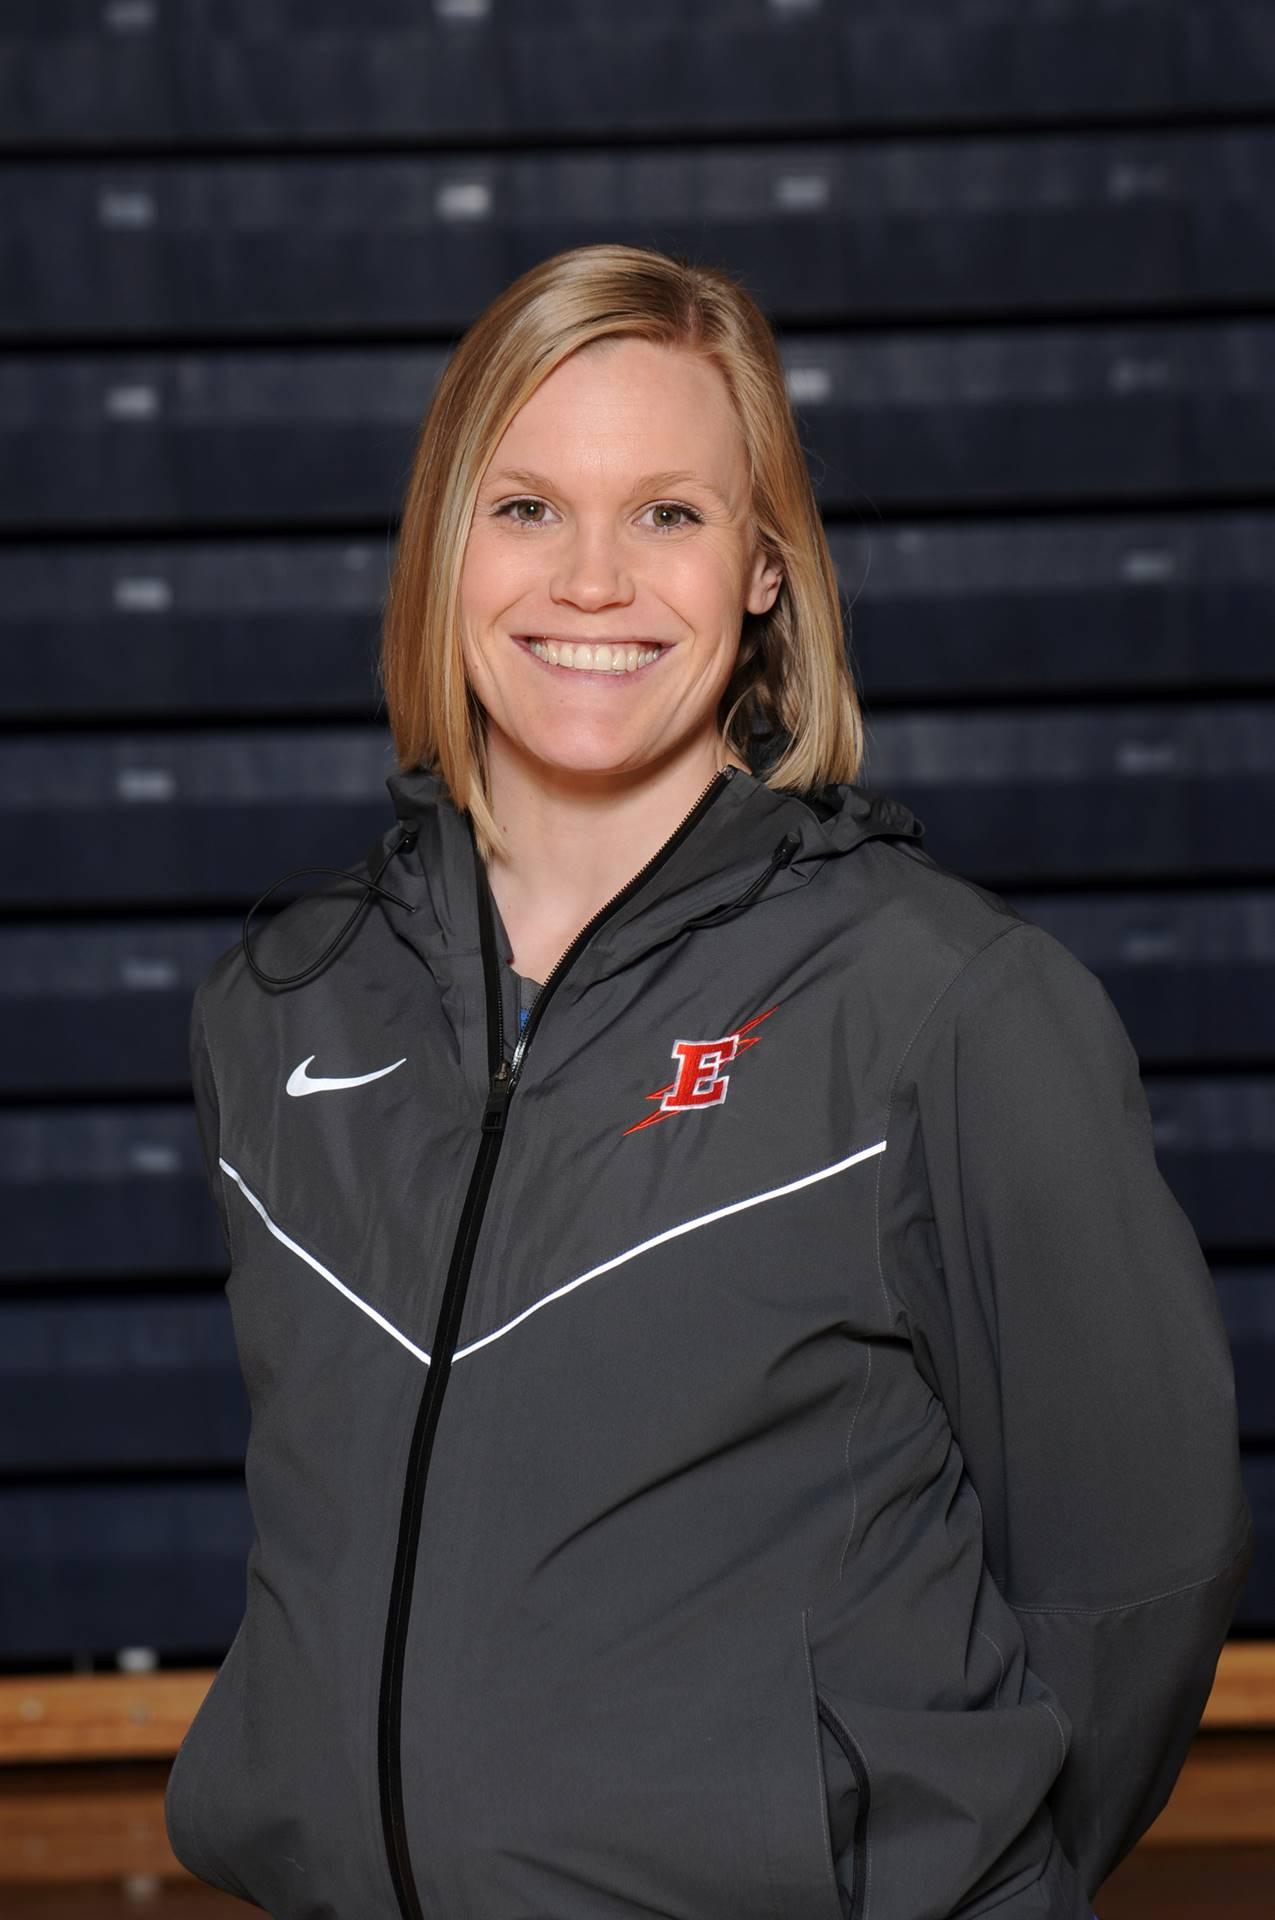 Assistant Coach - Tiffany Caponi